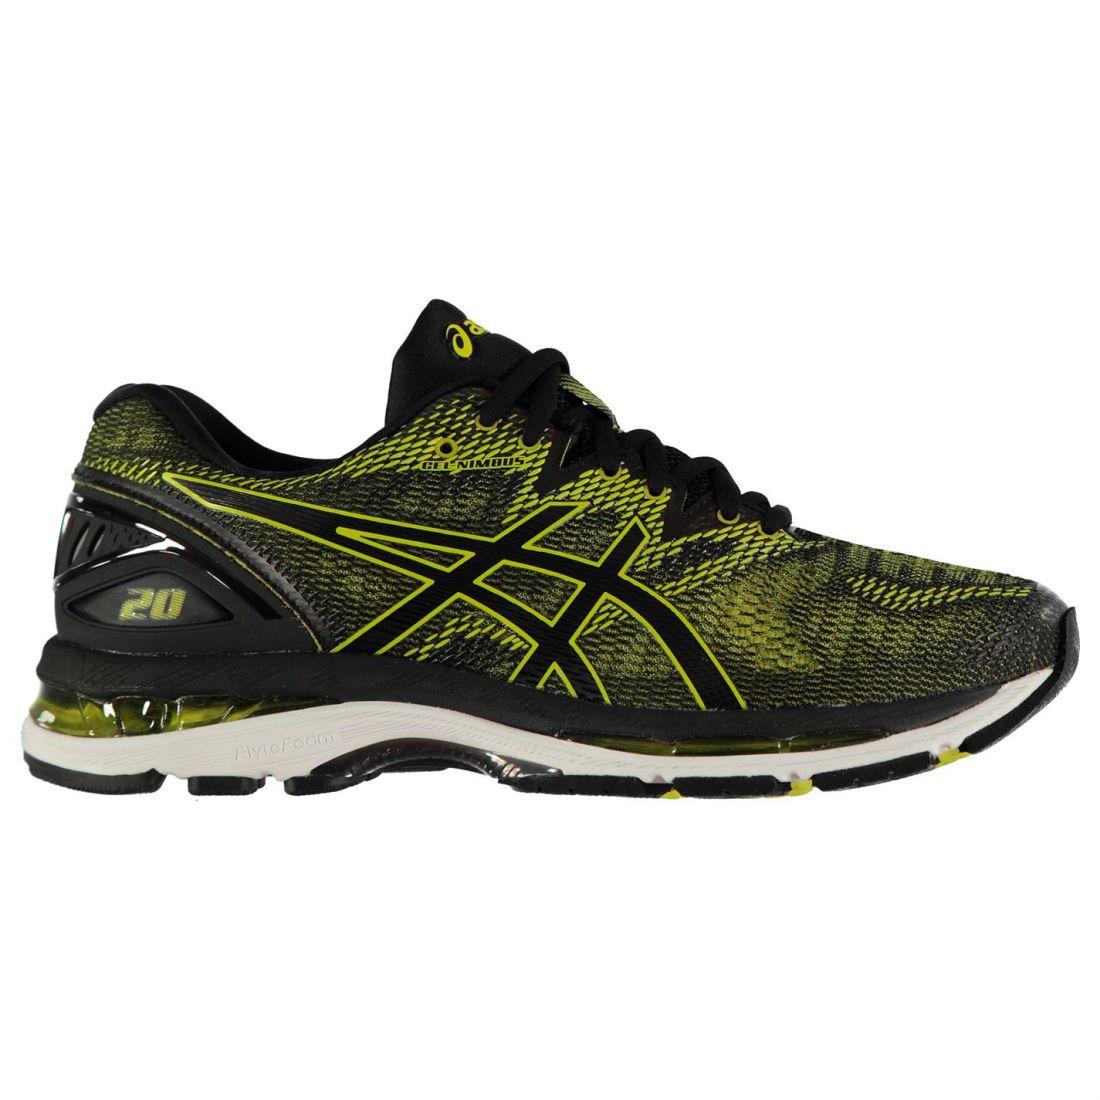 Asics Nimbus 20 Running shoes Mens Gents Road Lightweight Mesh Upper Stamp